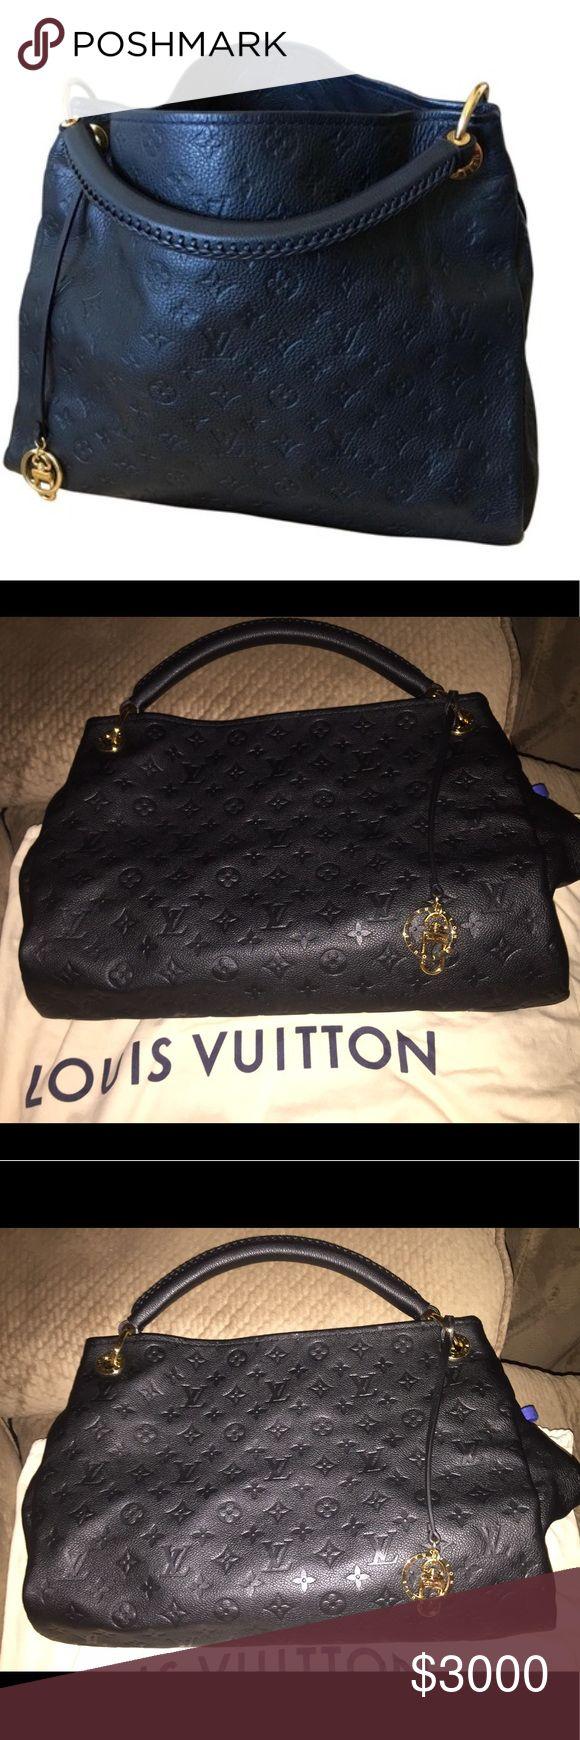 Authentic Louis Vuitton Pristine Artsy Empriente Brand new with box. Never worn. Louis Vuitton Bags